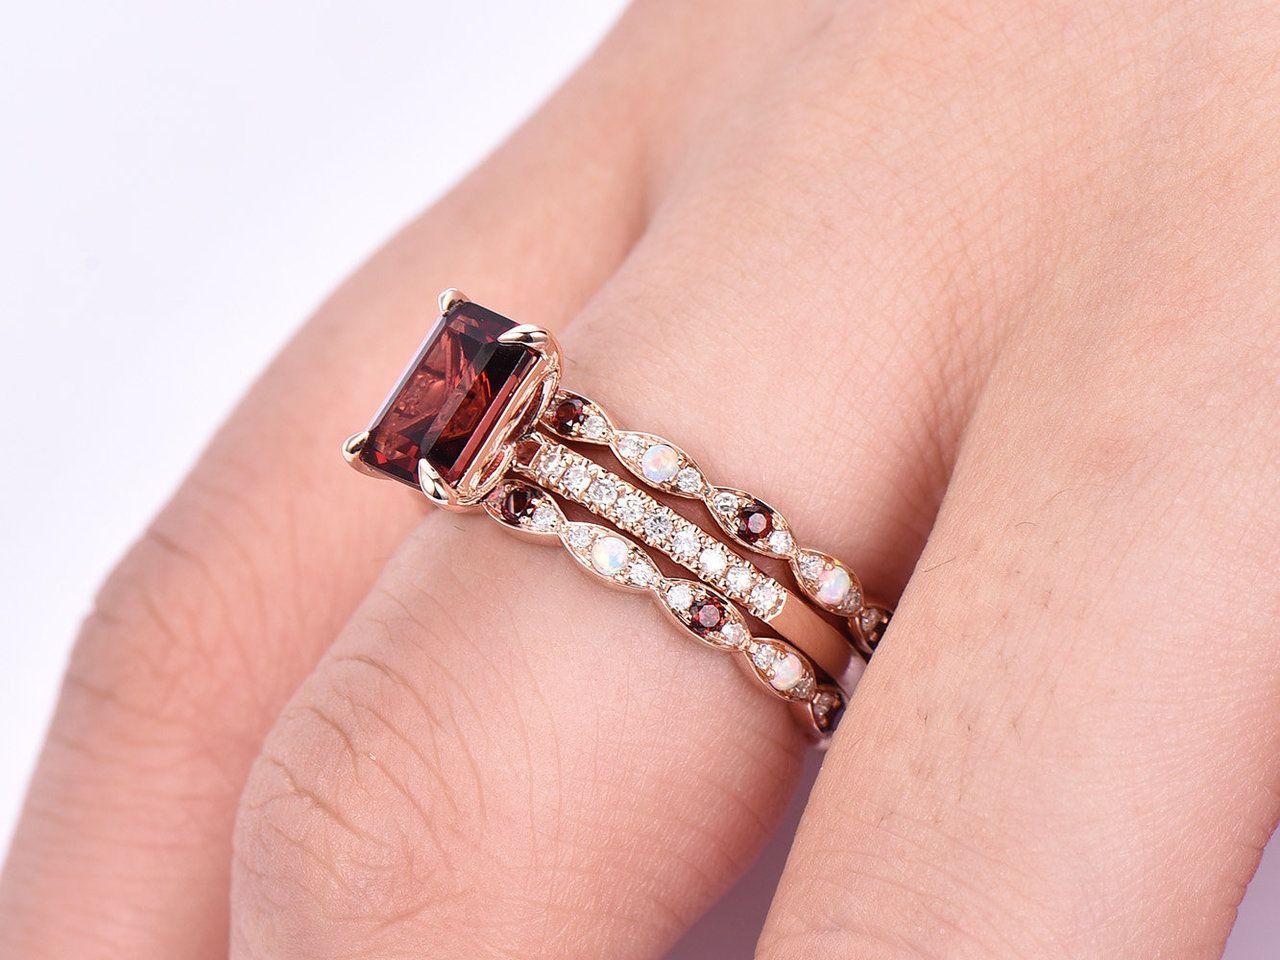 Garnet Wedding Set 2 Carat Garnet Engagement Rings Bbbgem Garnet Engagement Ring Rose Engagement Ring Pink Morganite Engagement Ring